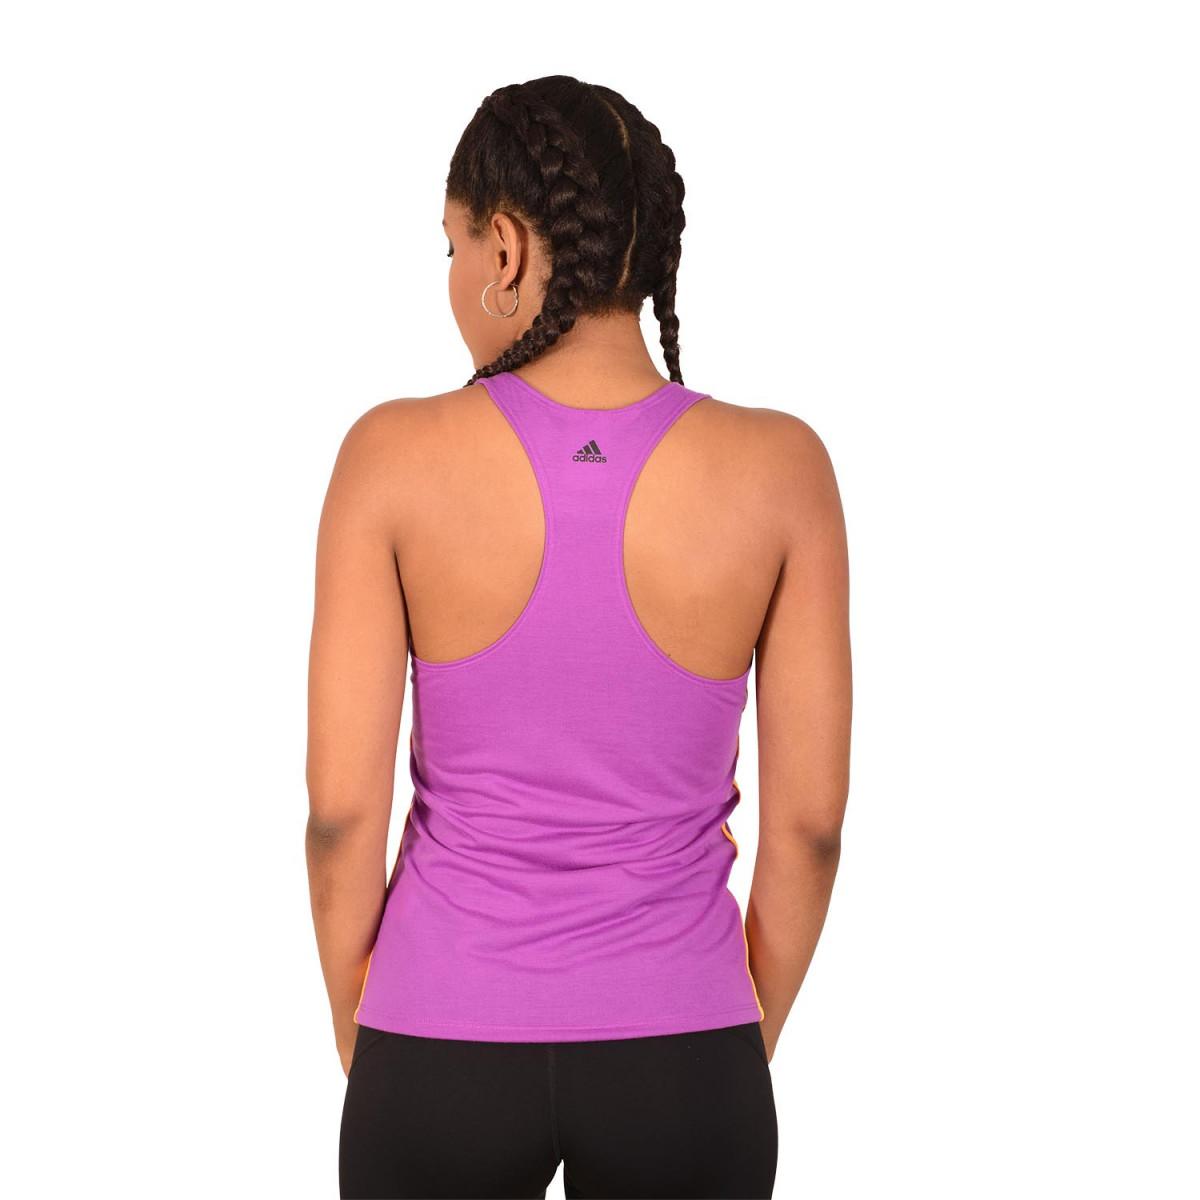 52ca54bd4 Musculosa Adidas Nex Generation - Remeras - Indumentaria - Mujer